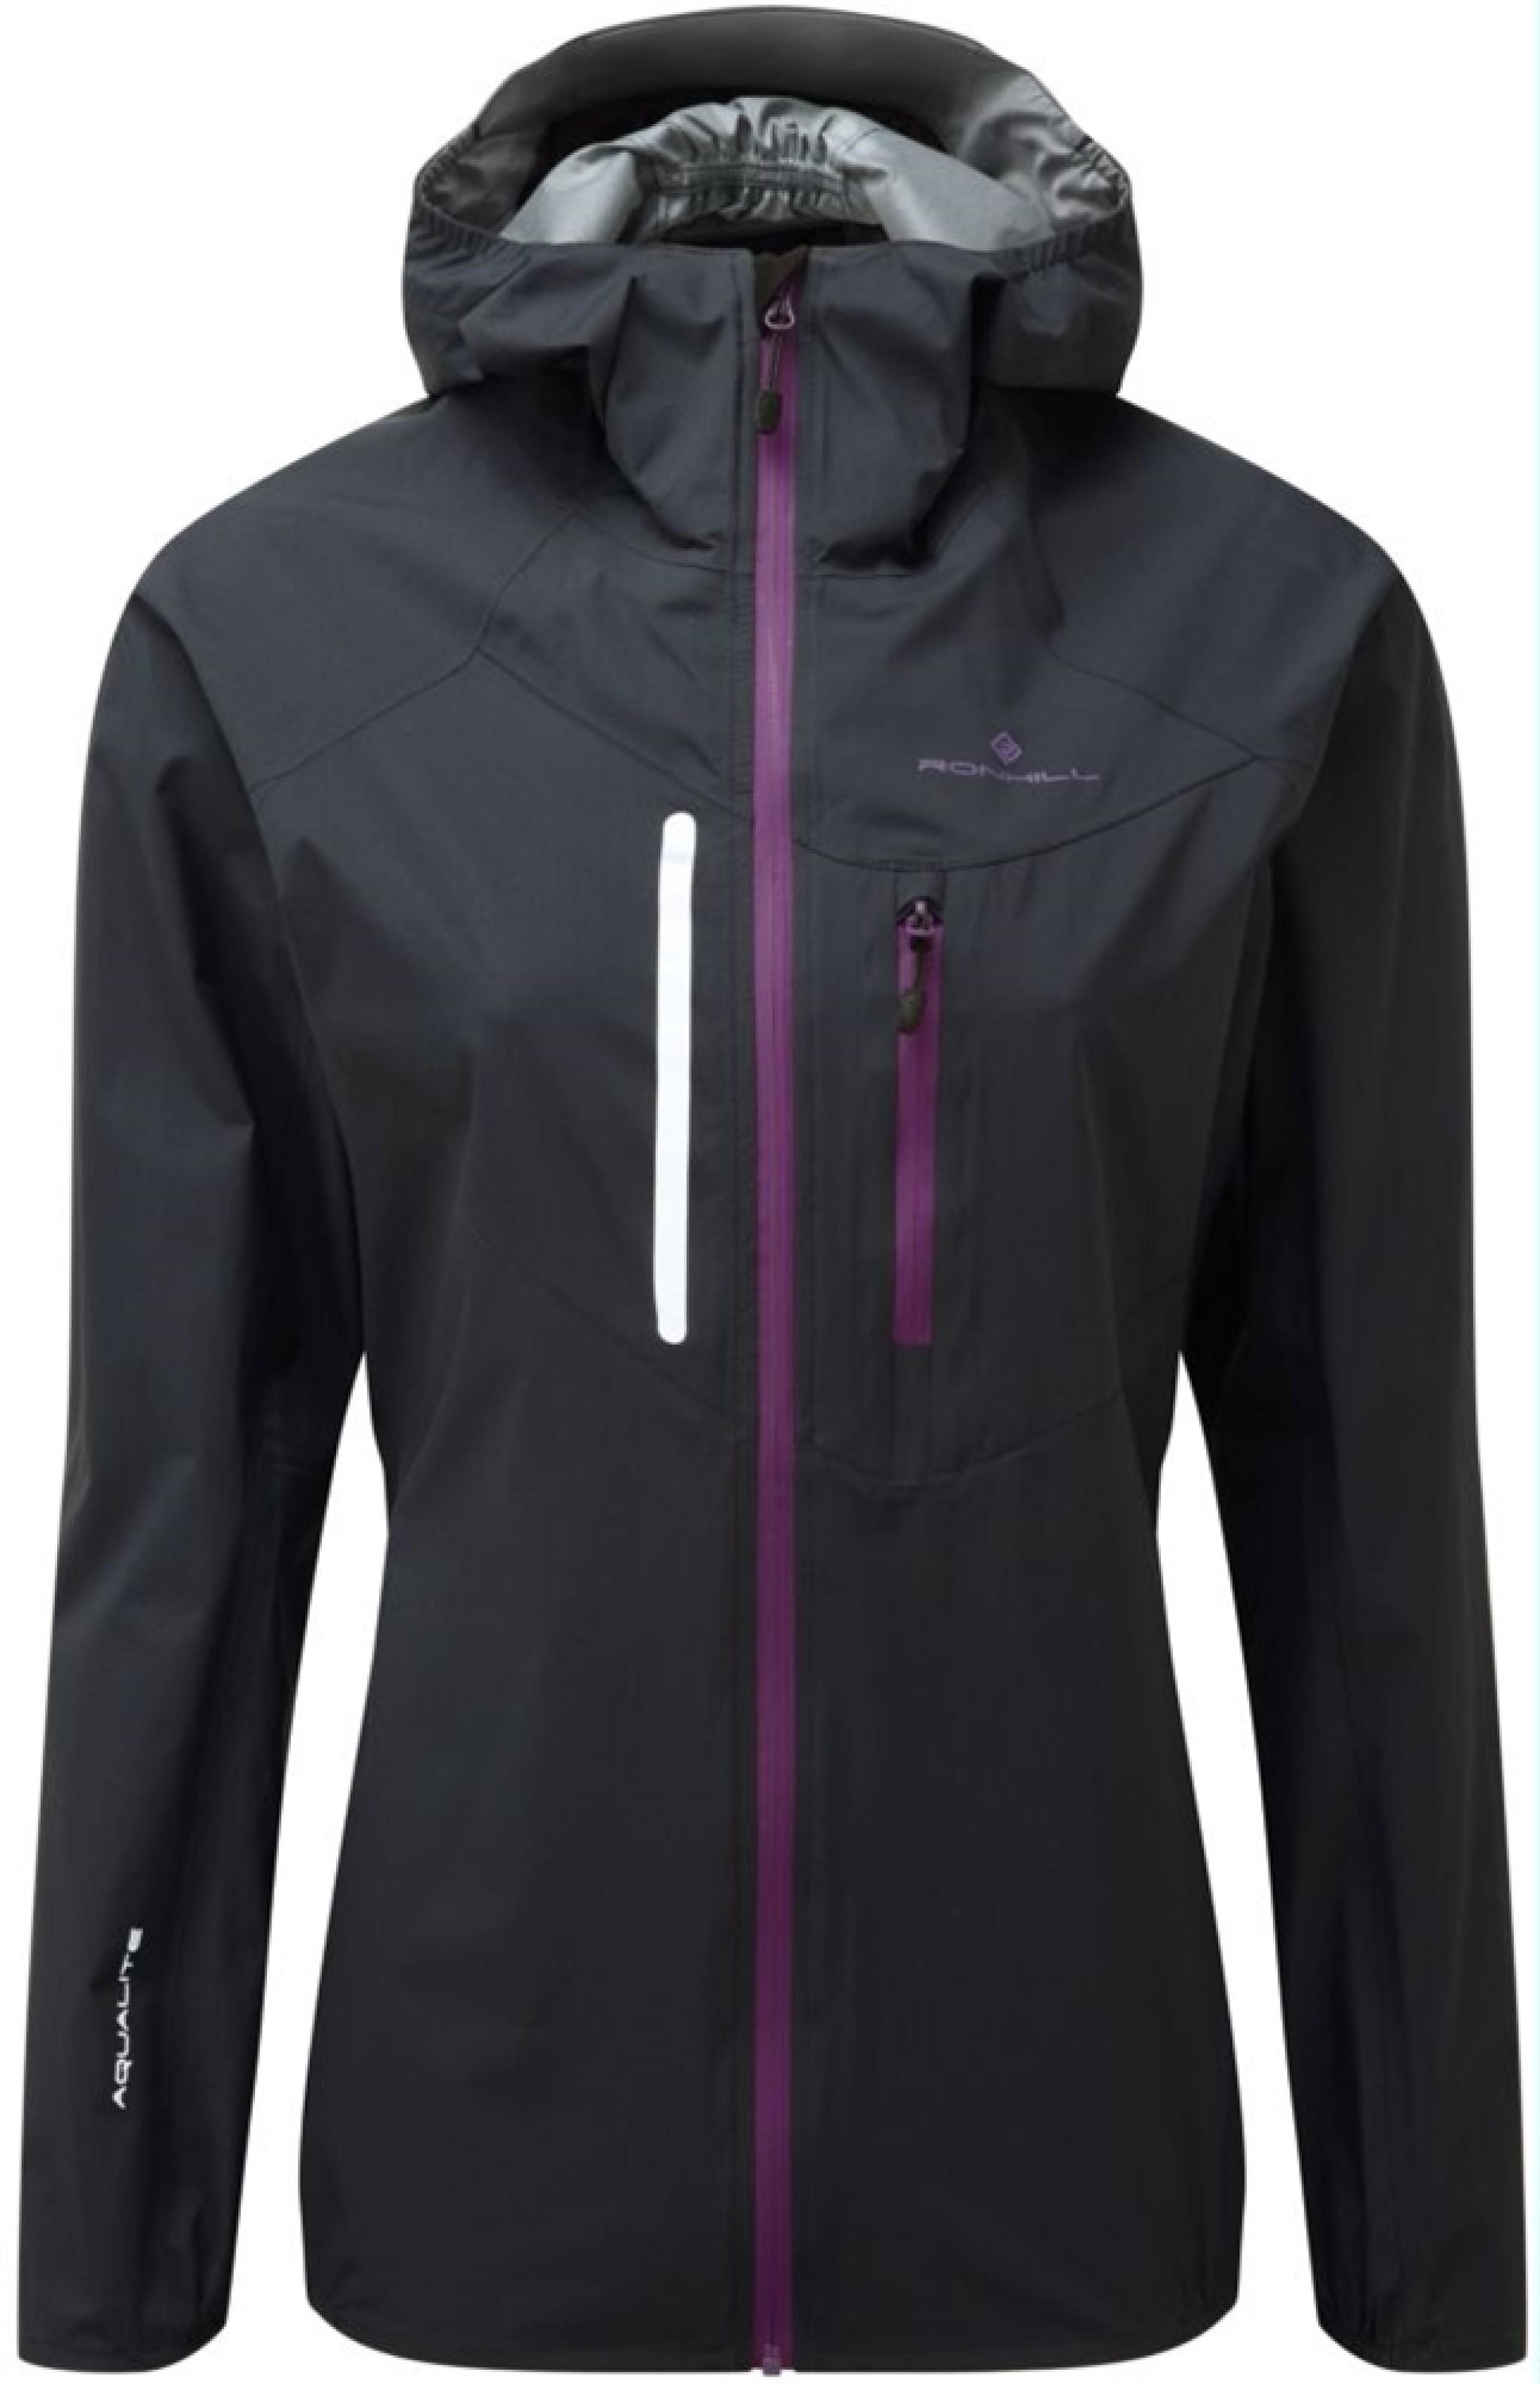 Rainfall Waterproof Running Jacket